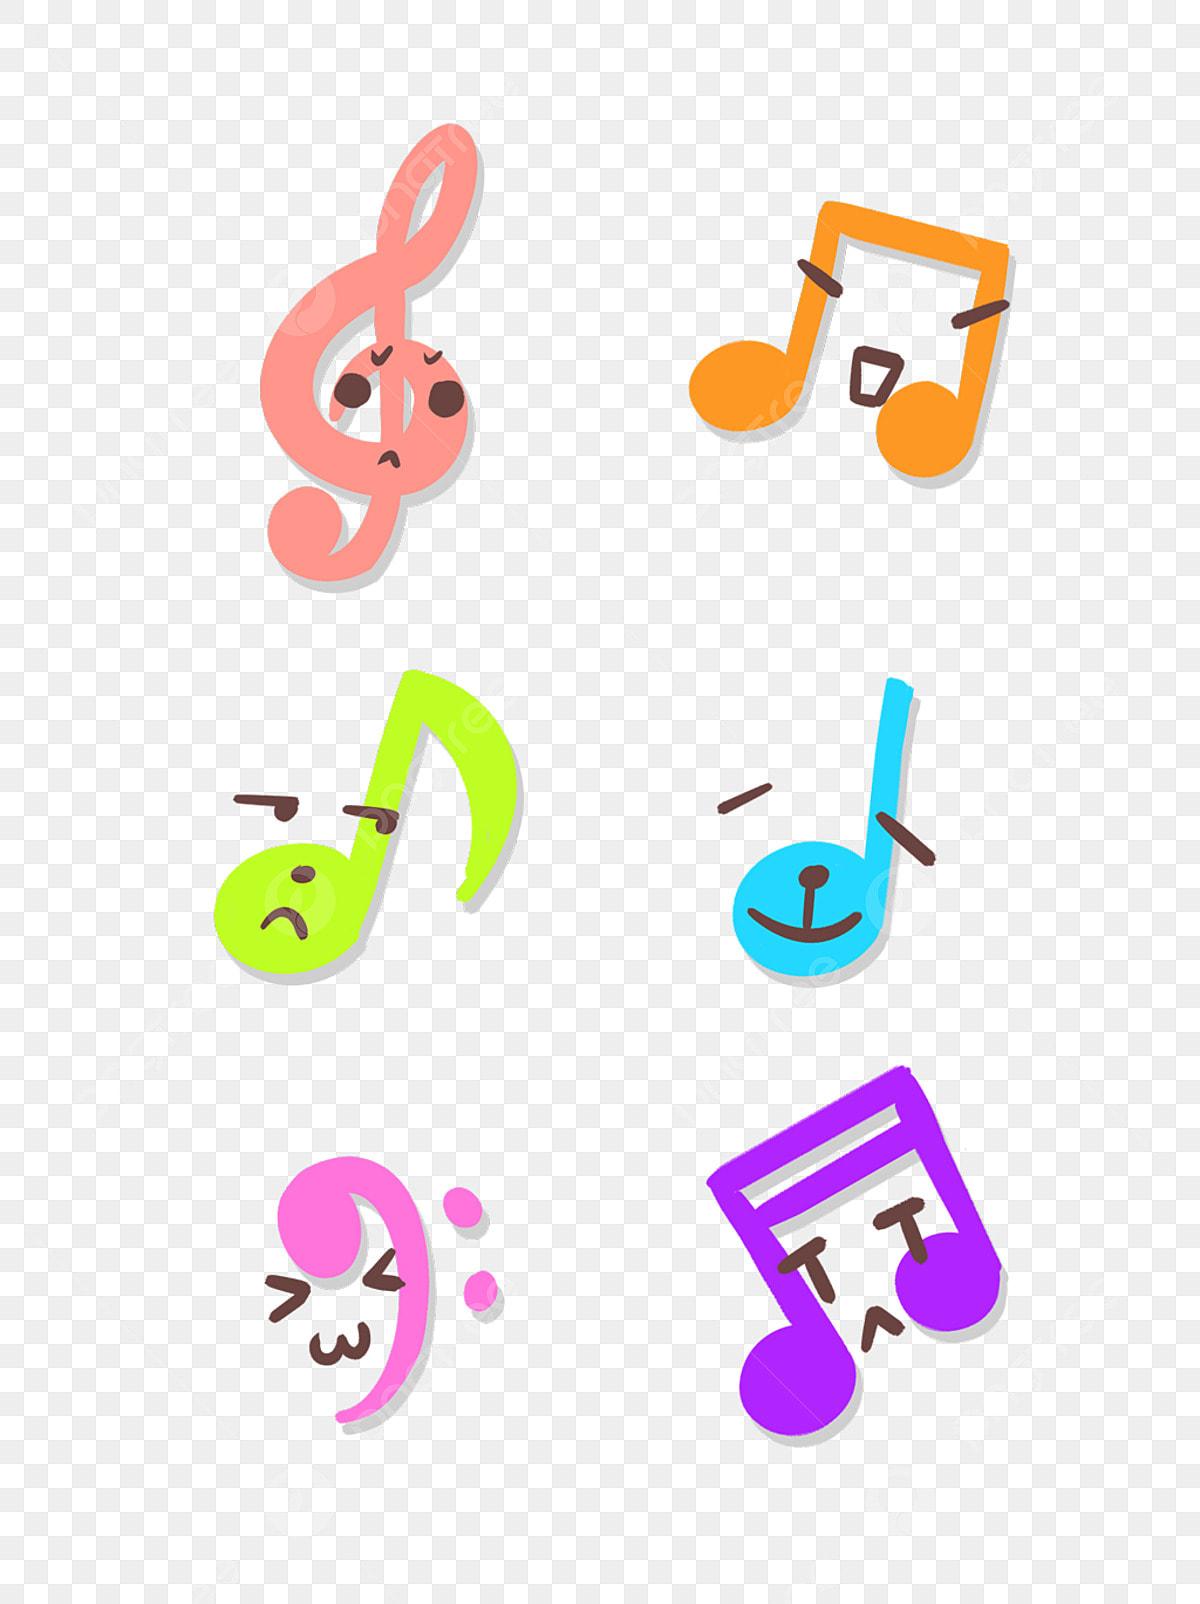 Hand Drawn Cartoon Cute Colorful Musical Notes Music ...